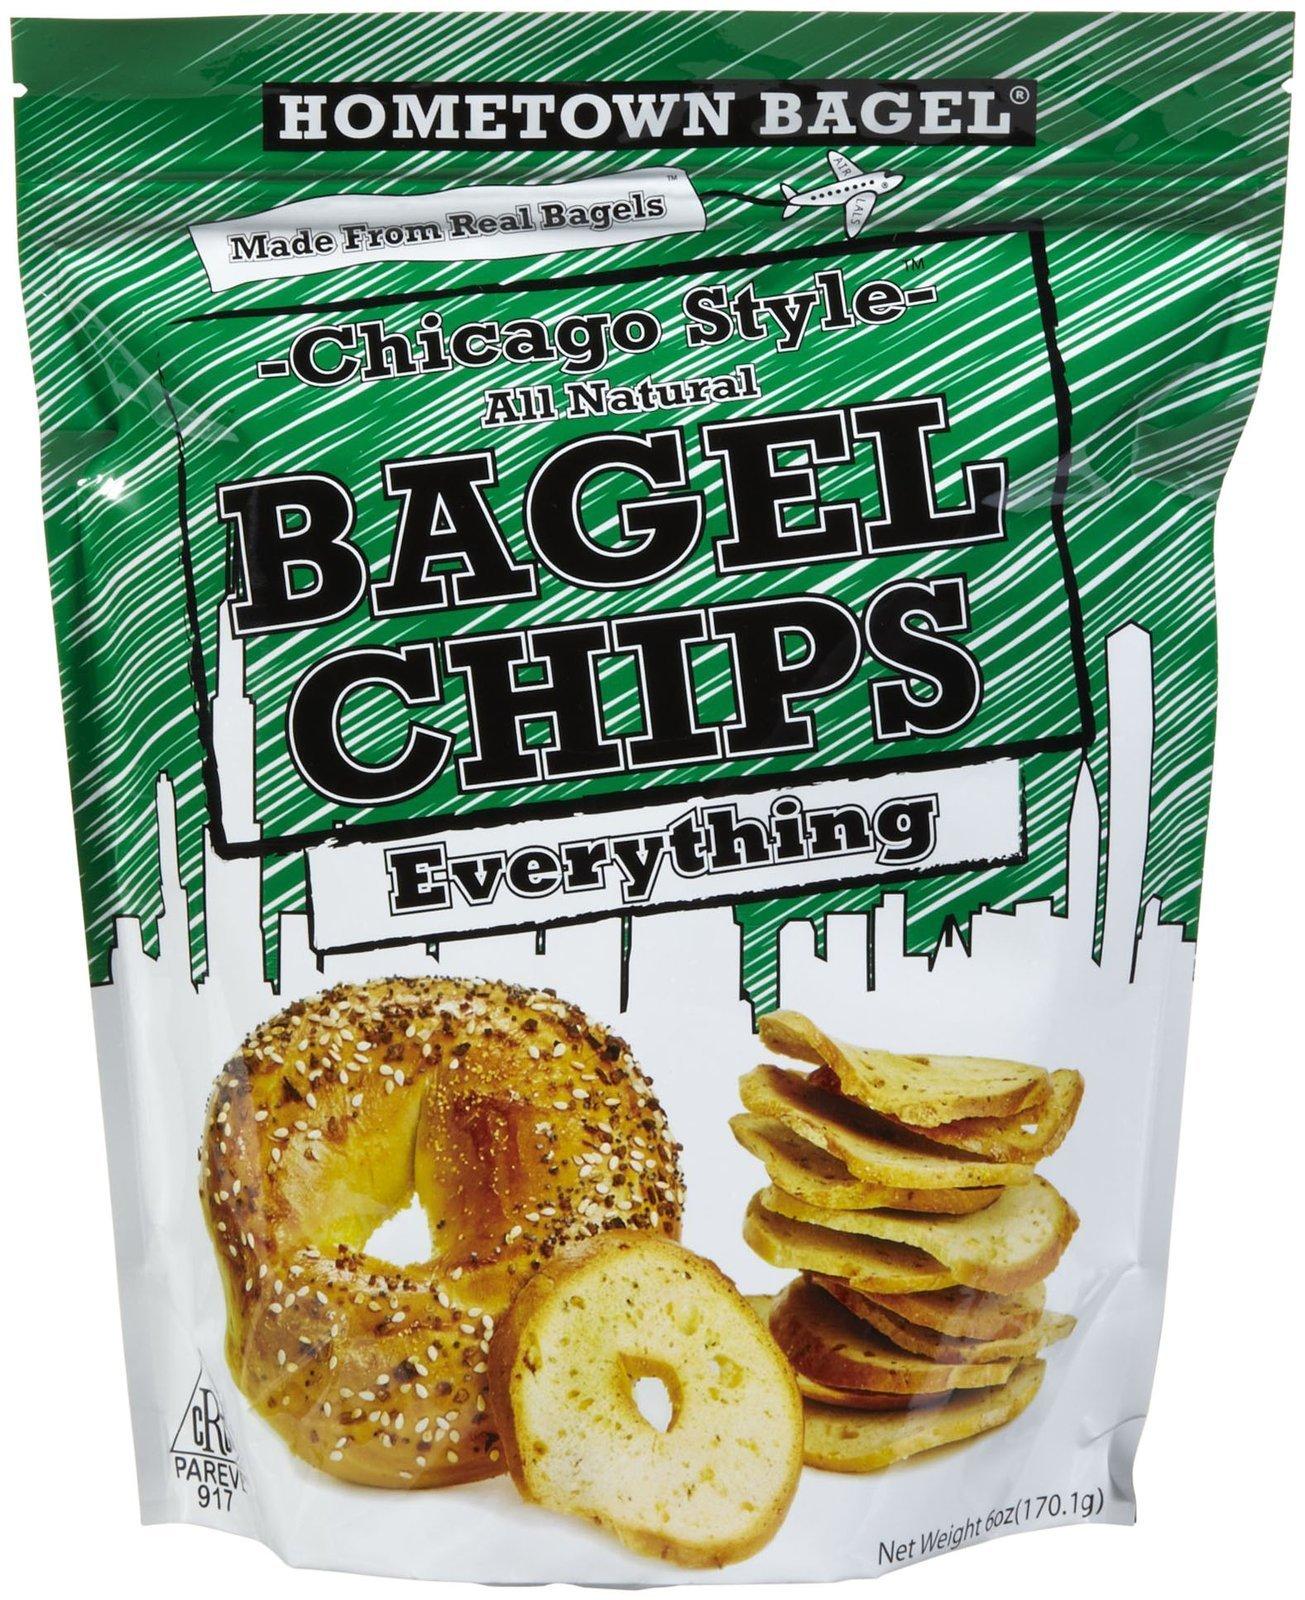 Hometown Bagel All Natural Everything Bagel Chips - 6 oz